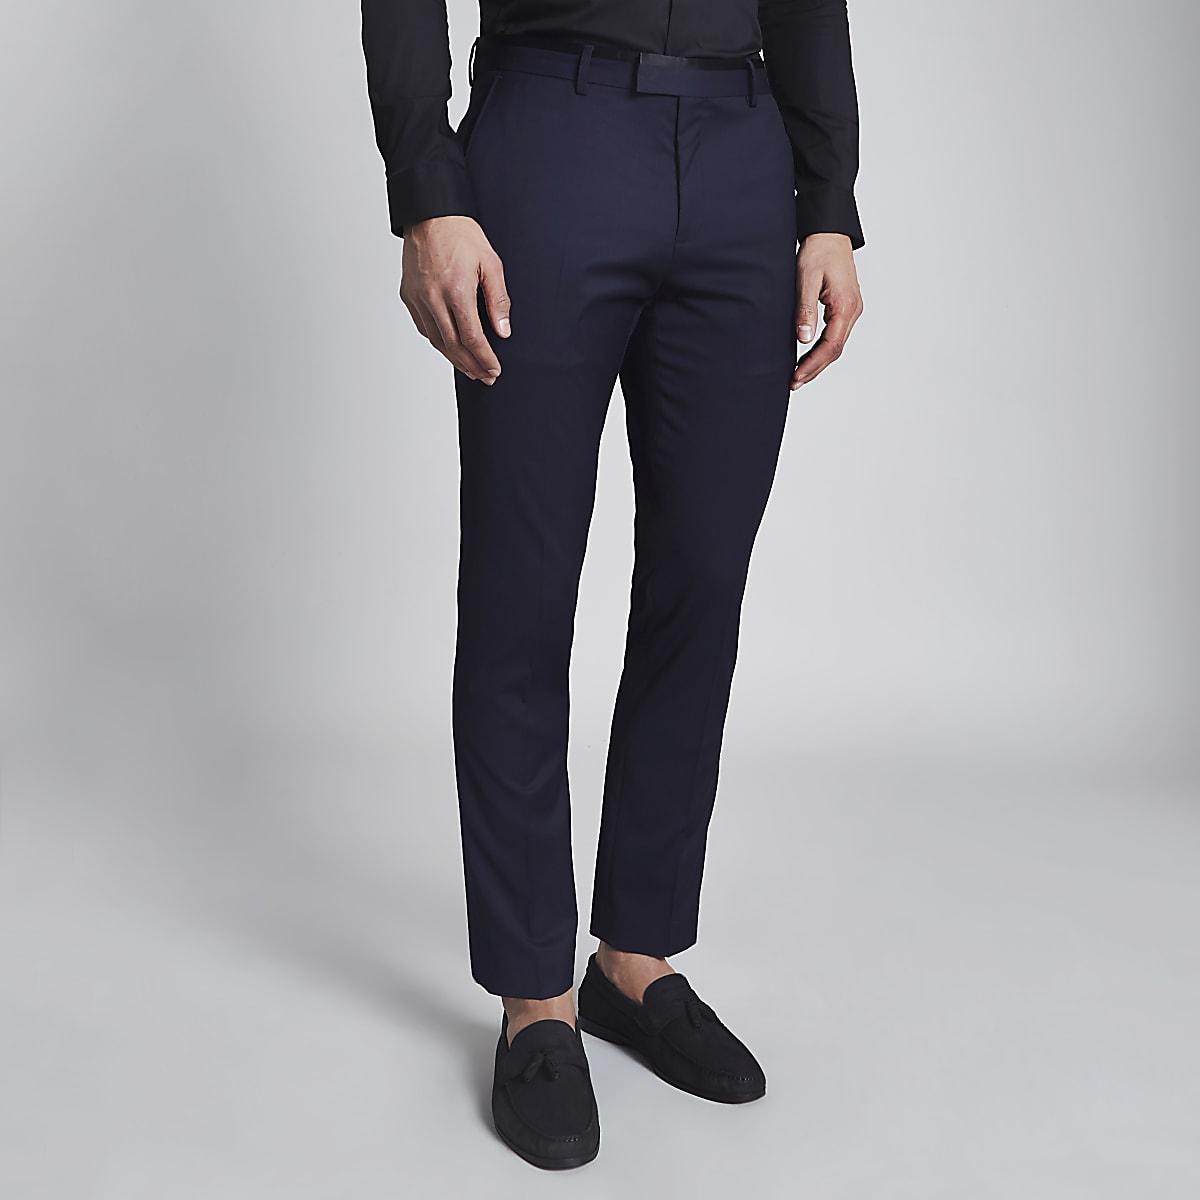 Navy skinny tuxedo trousers